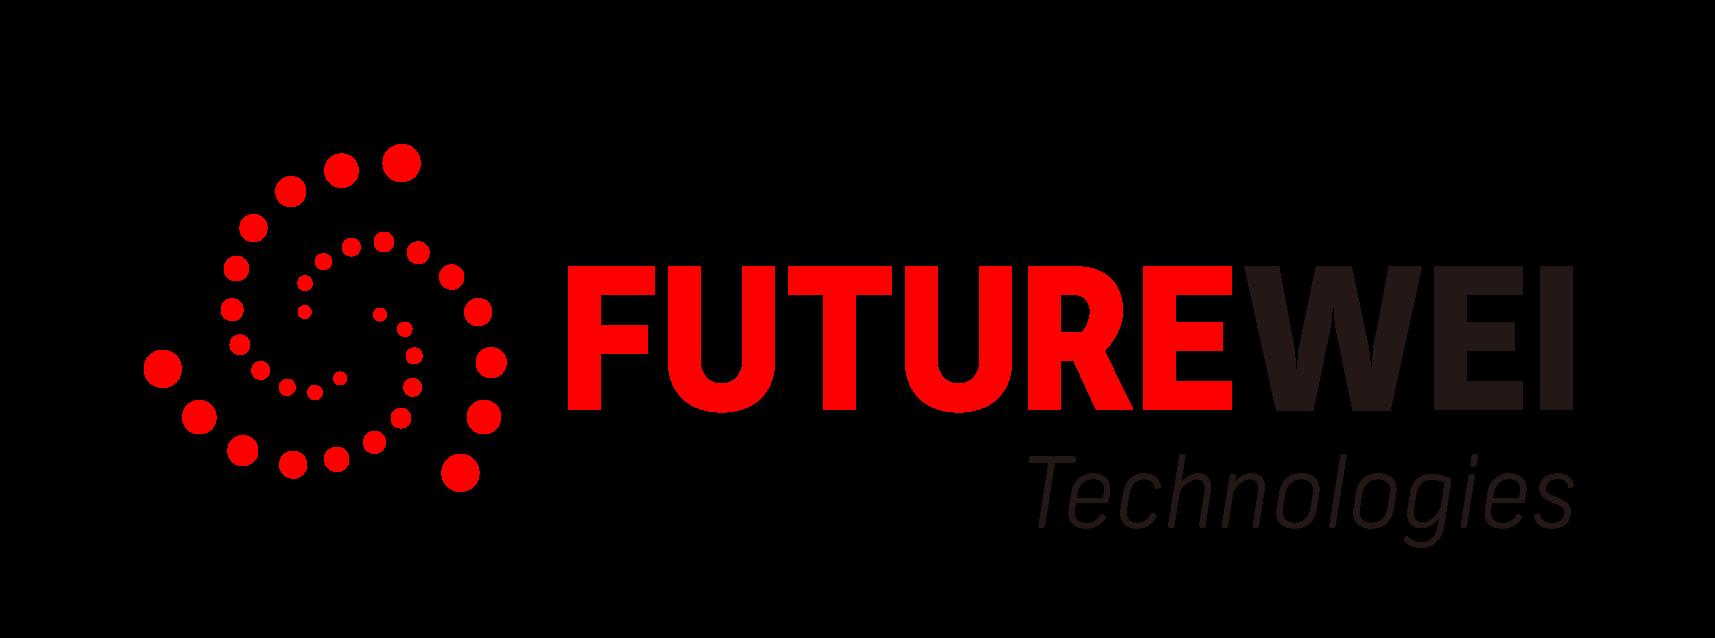 Futurewei Technologies